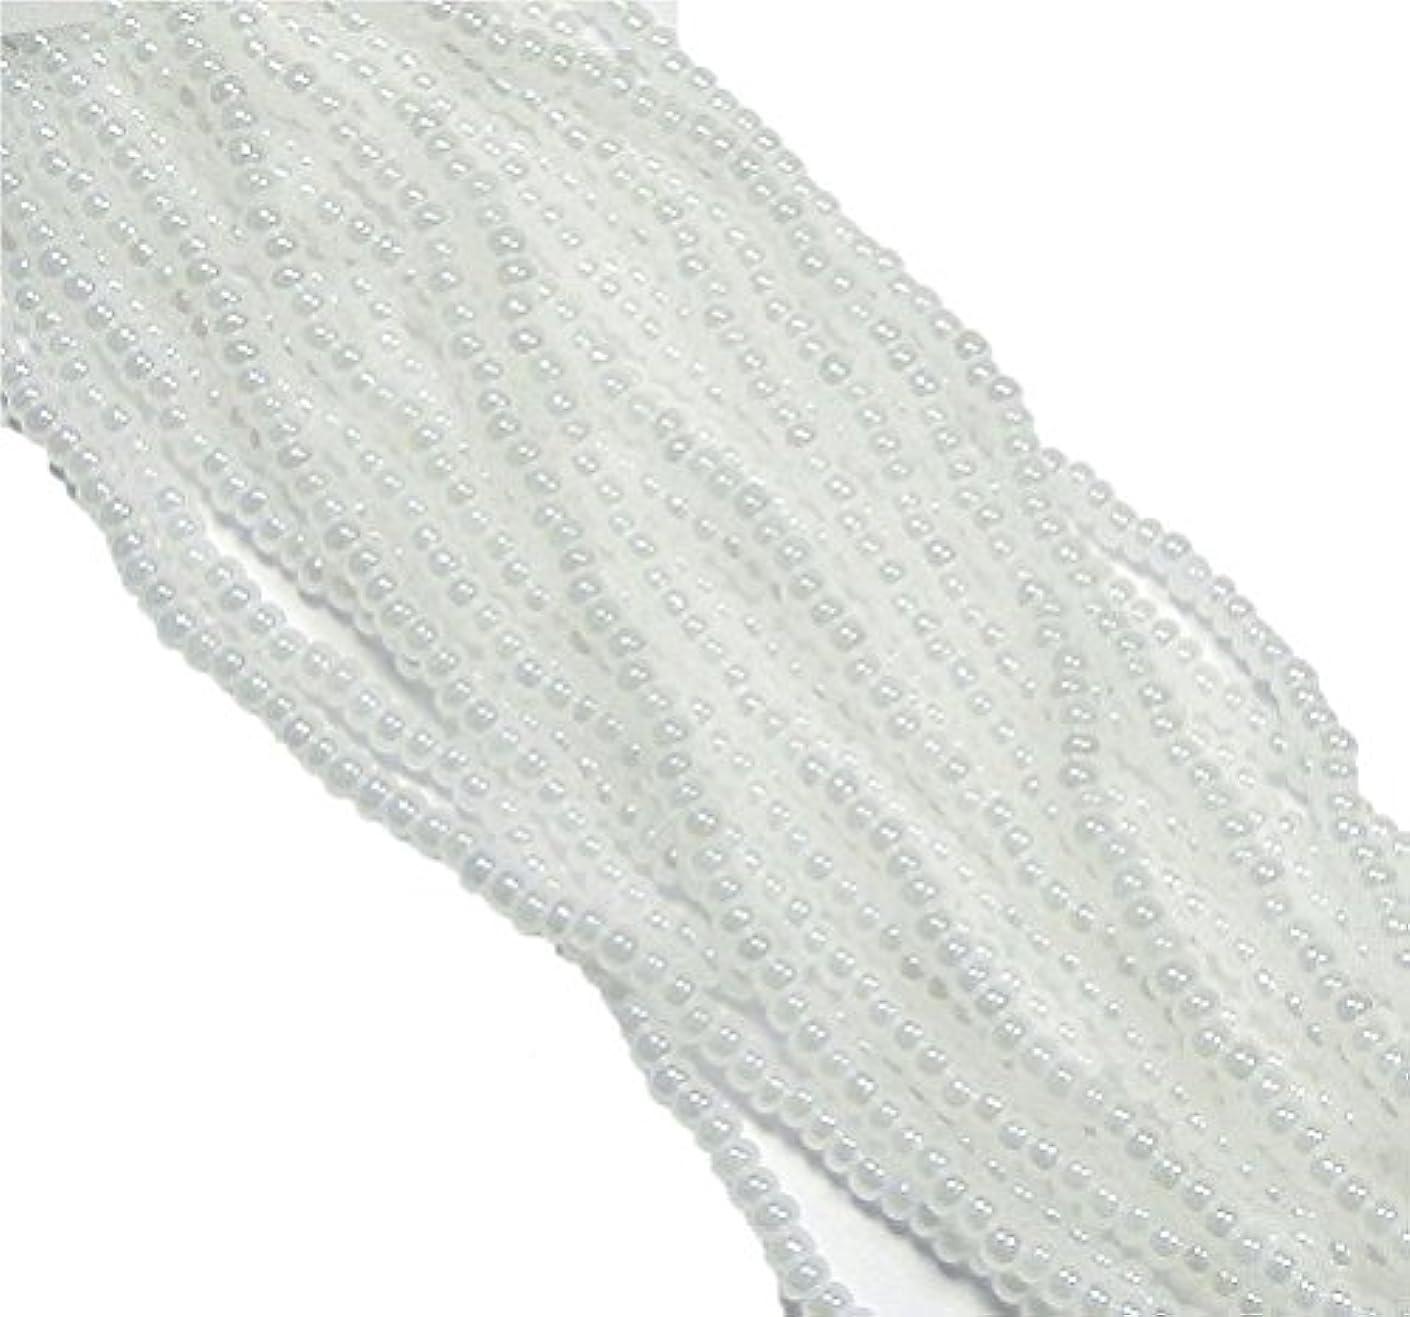 Genuine Jablonex Preciosa Czech Glass Seed Beads 11/0 Ceylon (Pearlized) - Mini Hanks White Pearl